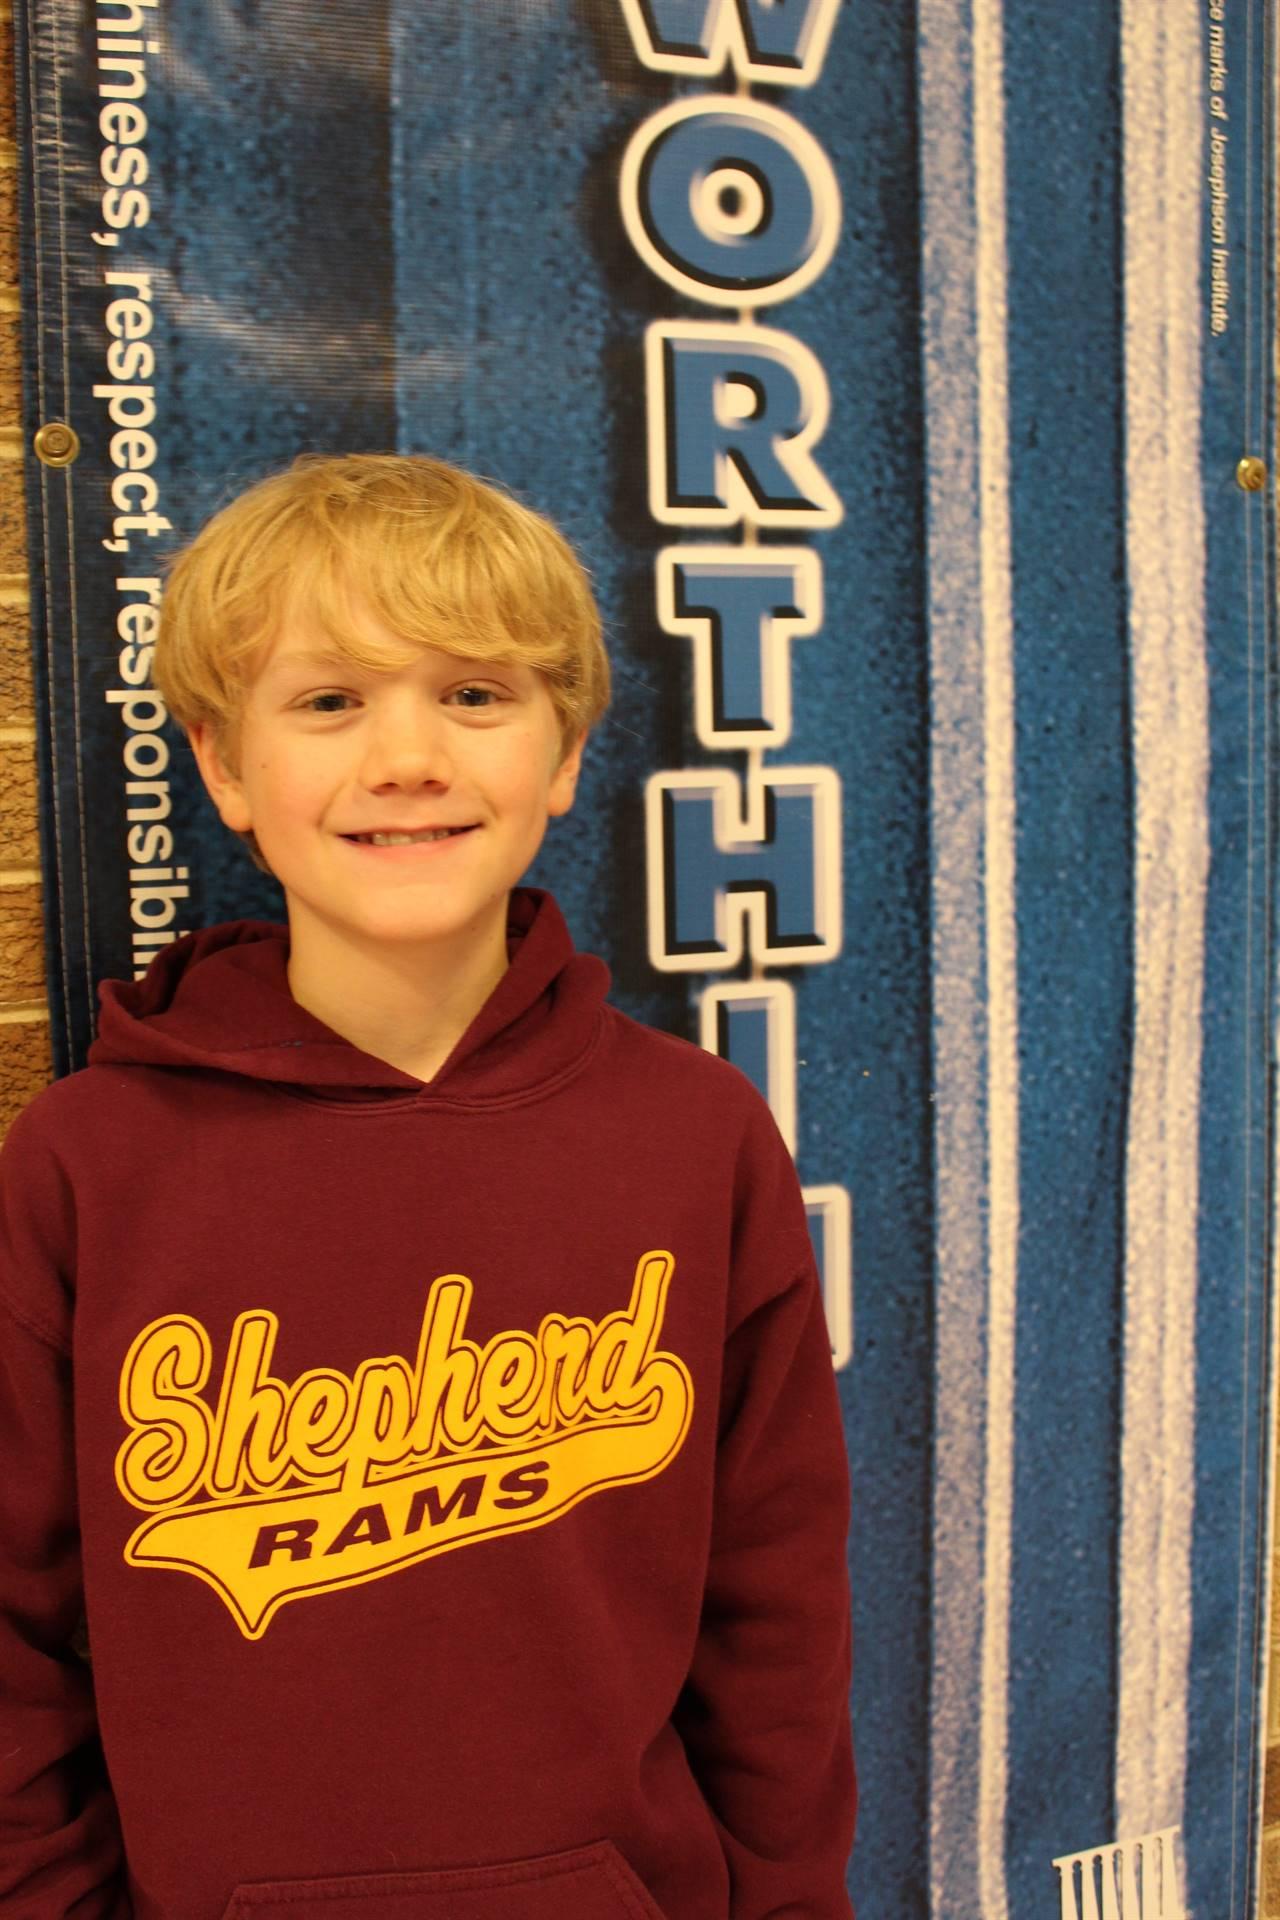 Noah U. (October - Student of Character (Trustworthiness)